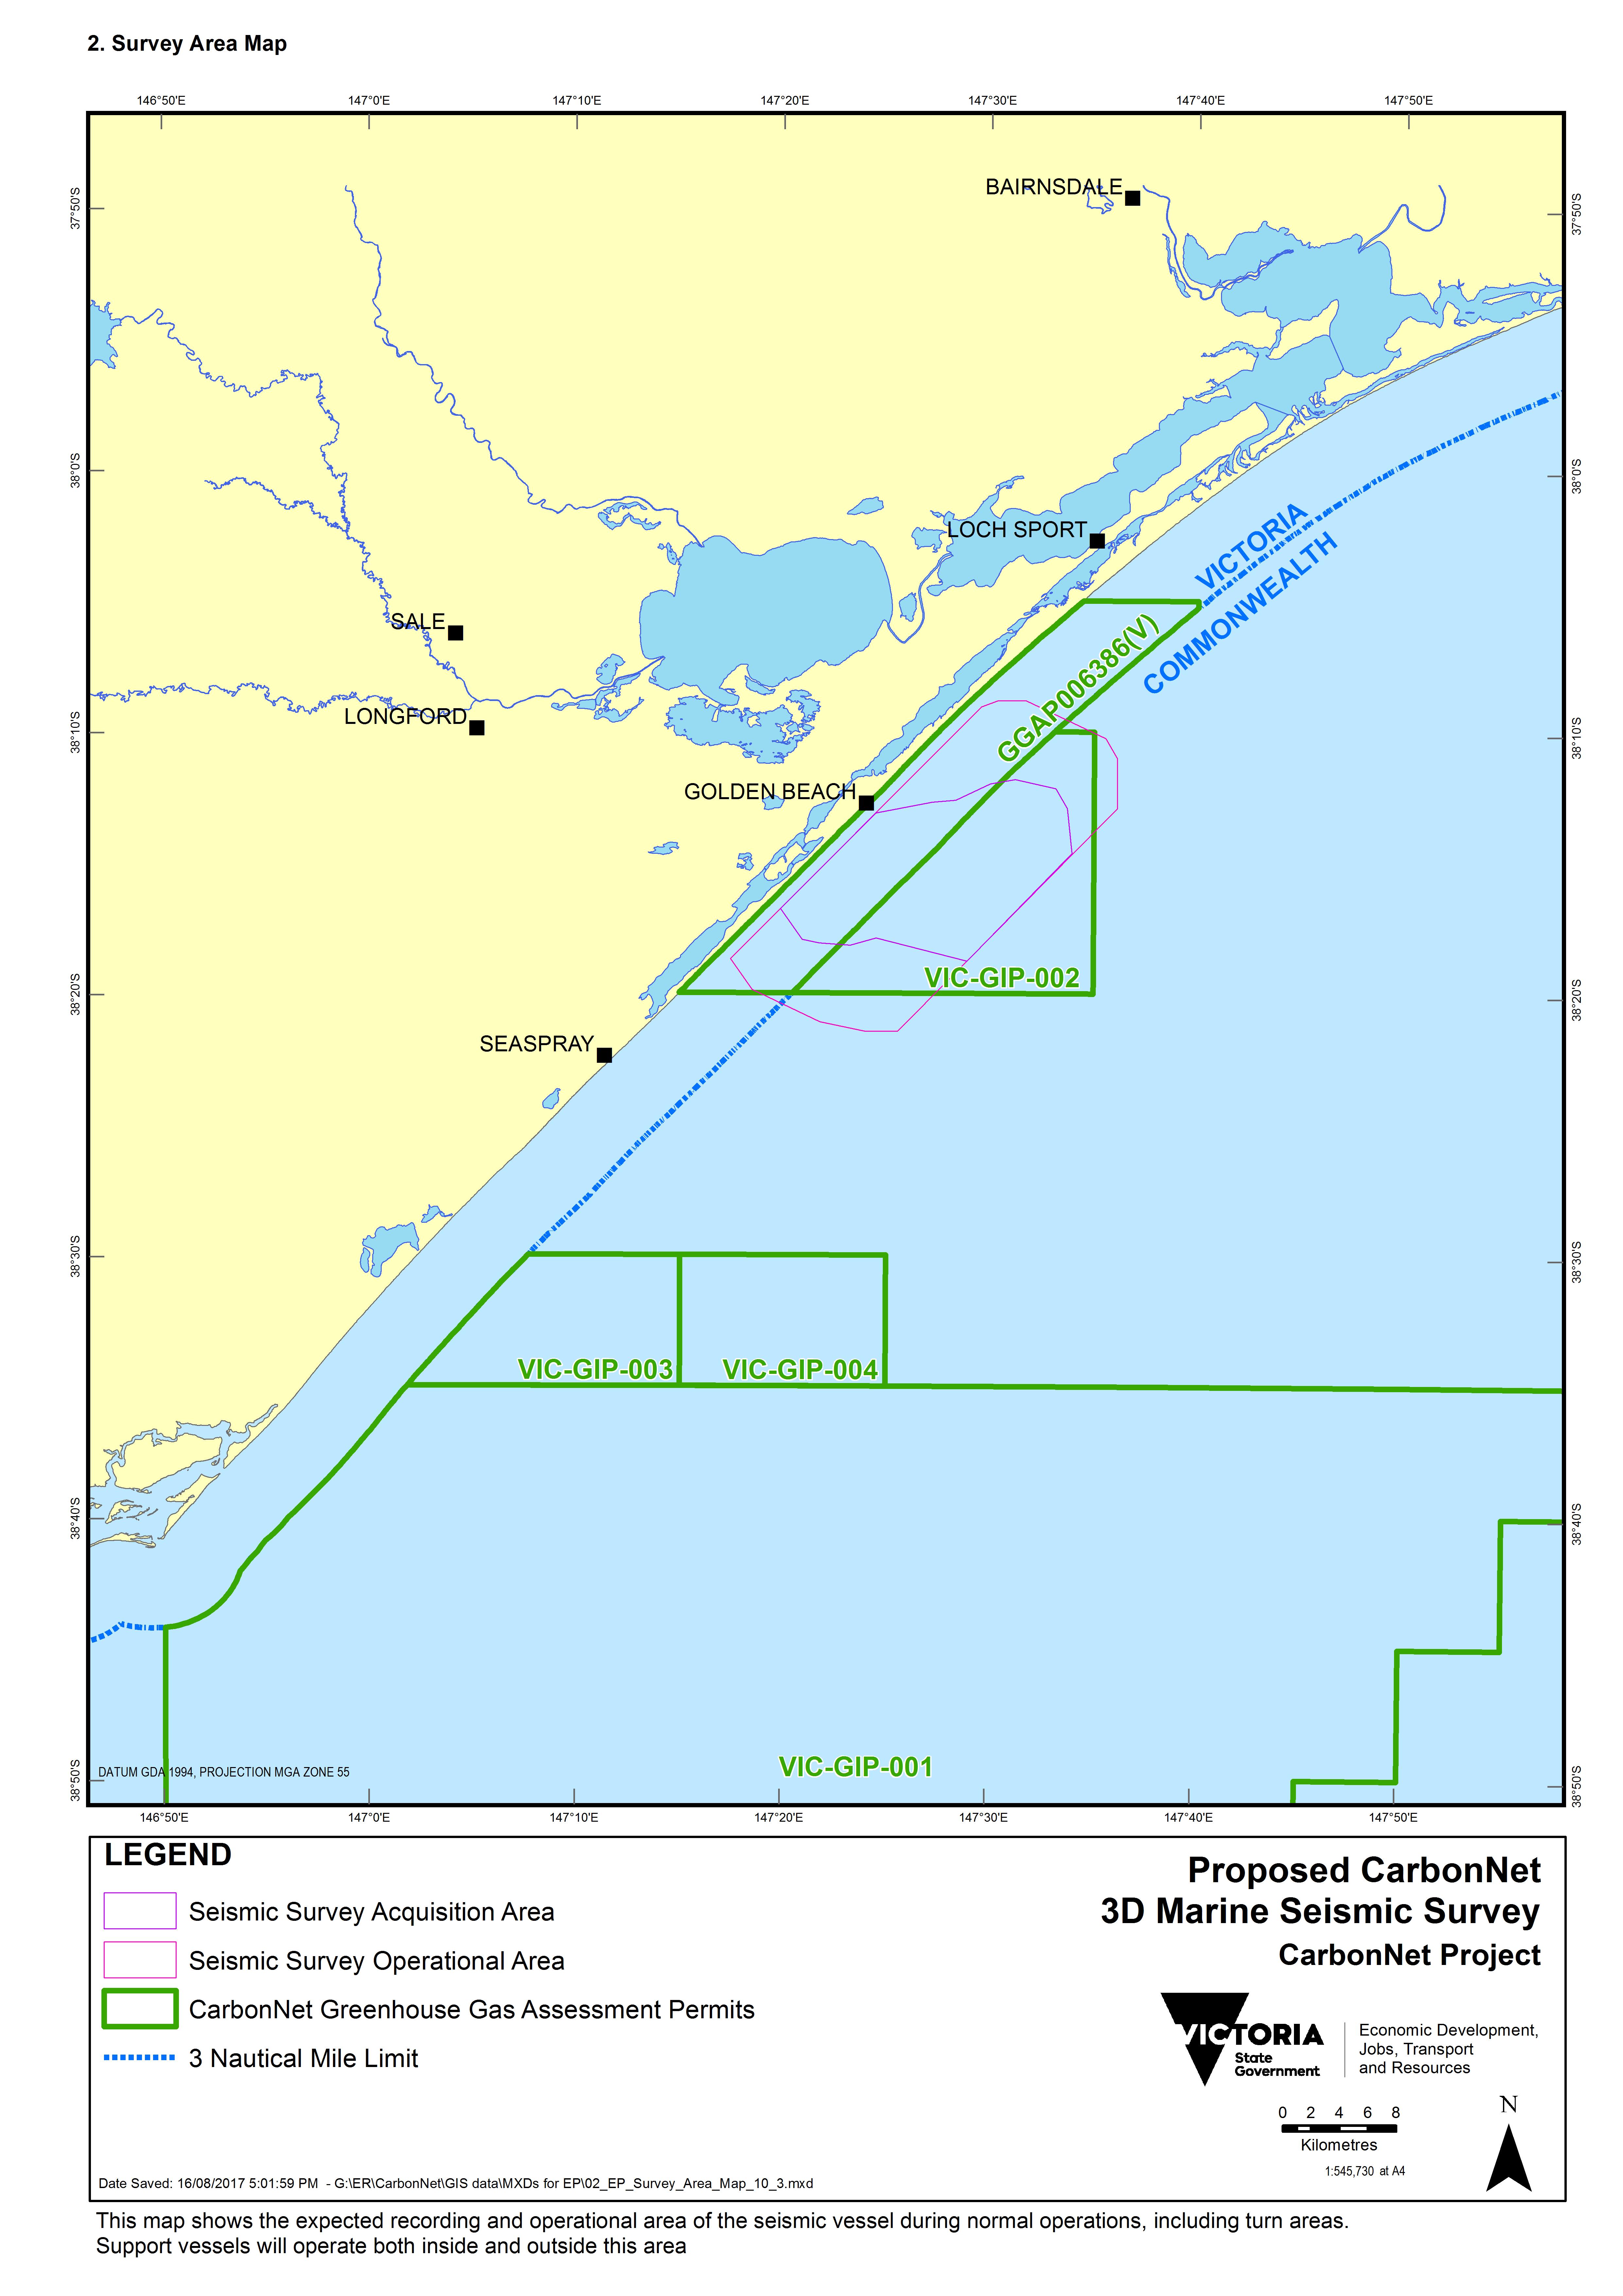 Location map - Activity: Pelican 3D Marine Seismic Survey (refer to description)